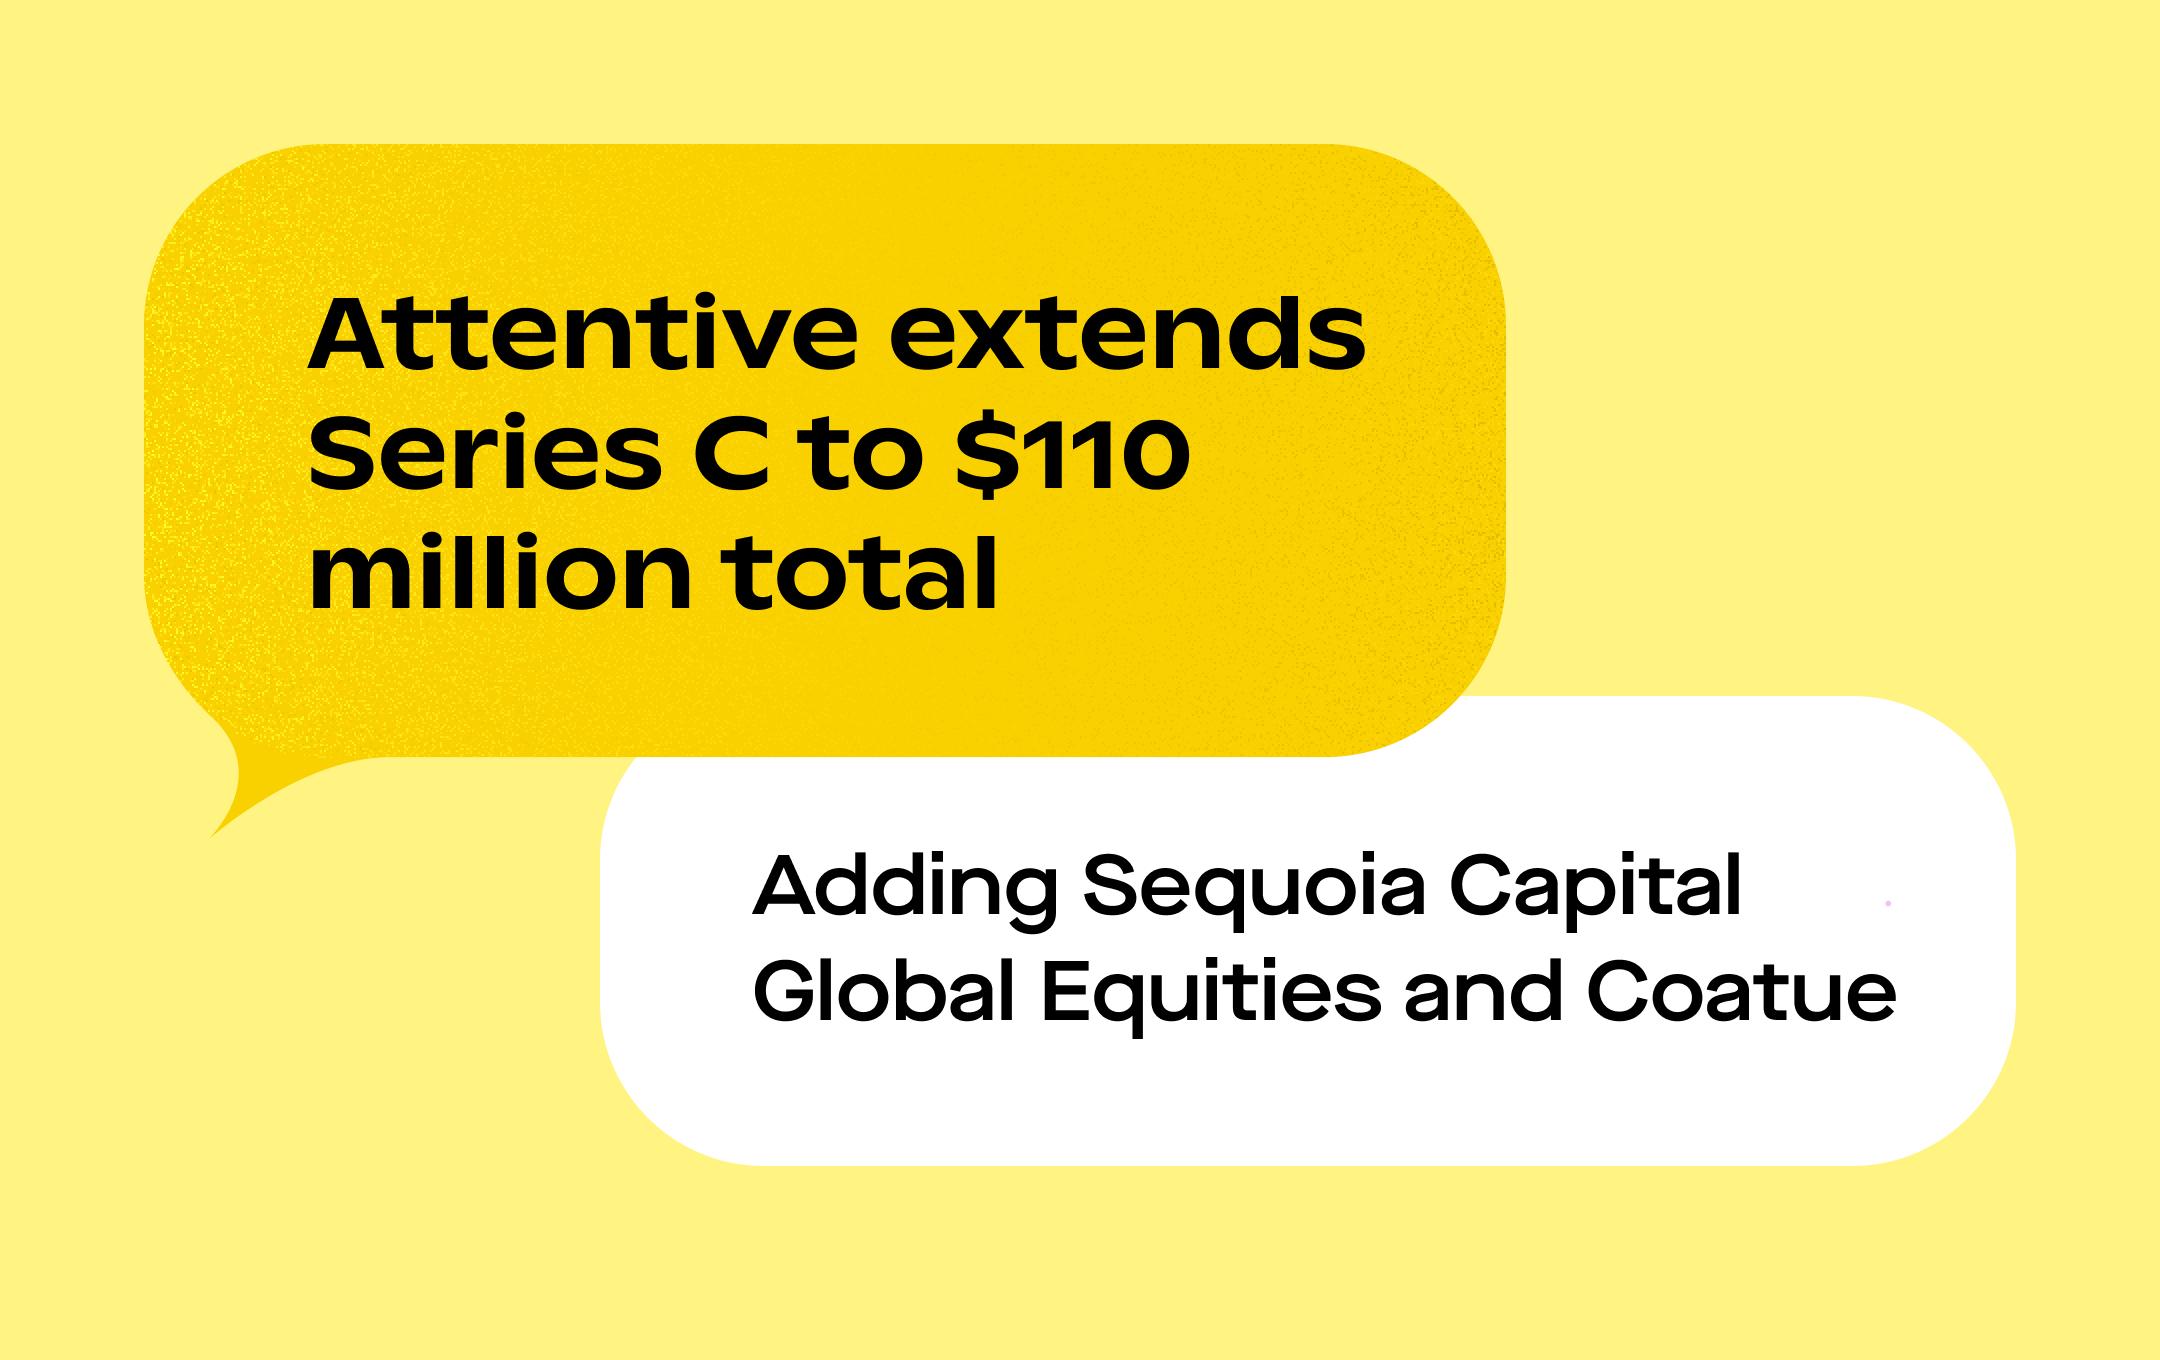 Series C funding announcement graphic